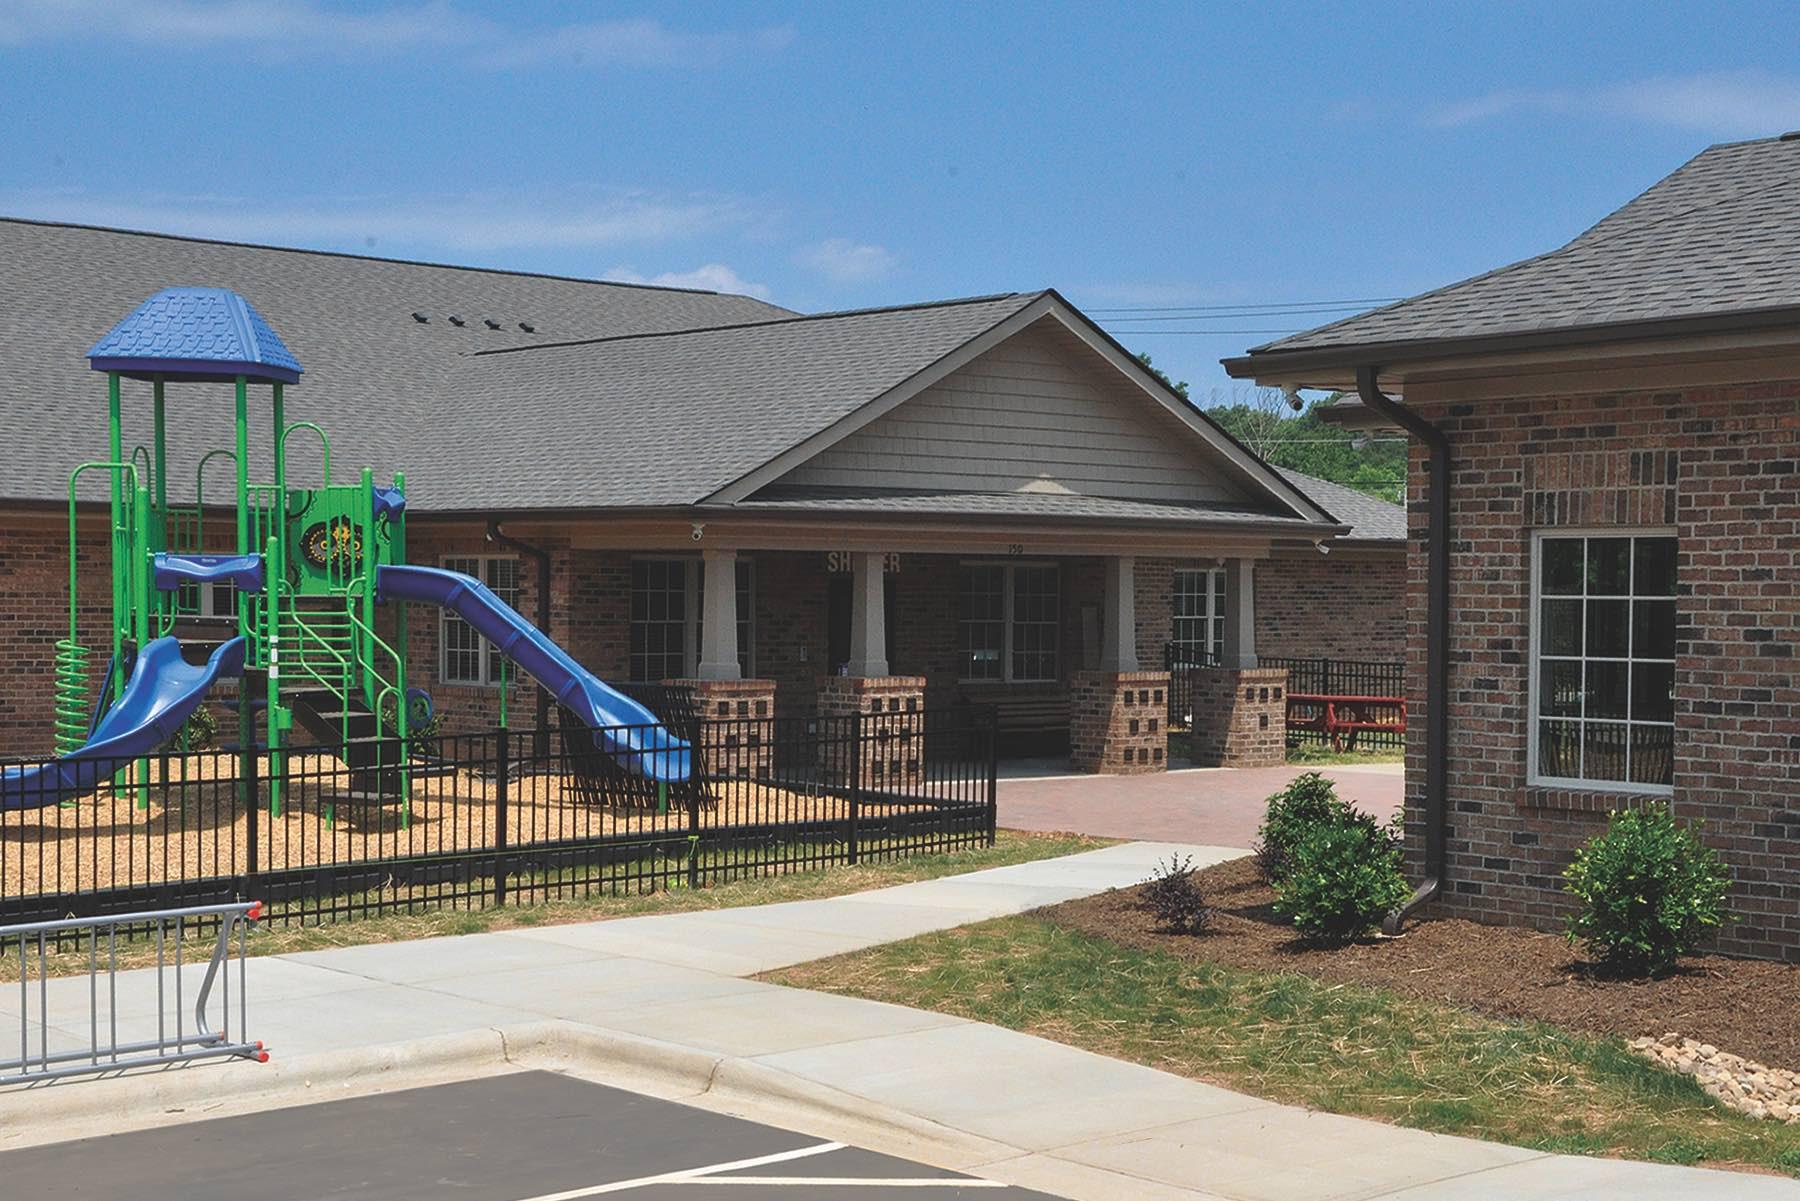 Union County Community Shelter